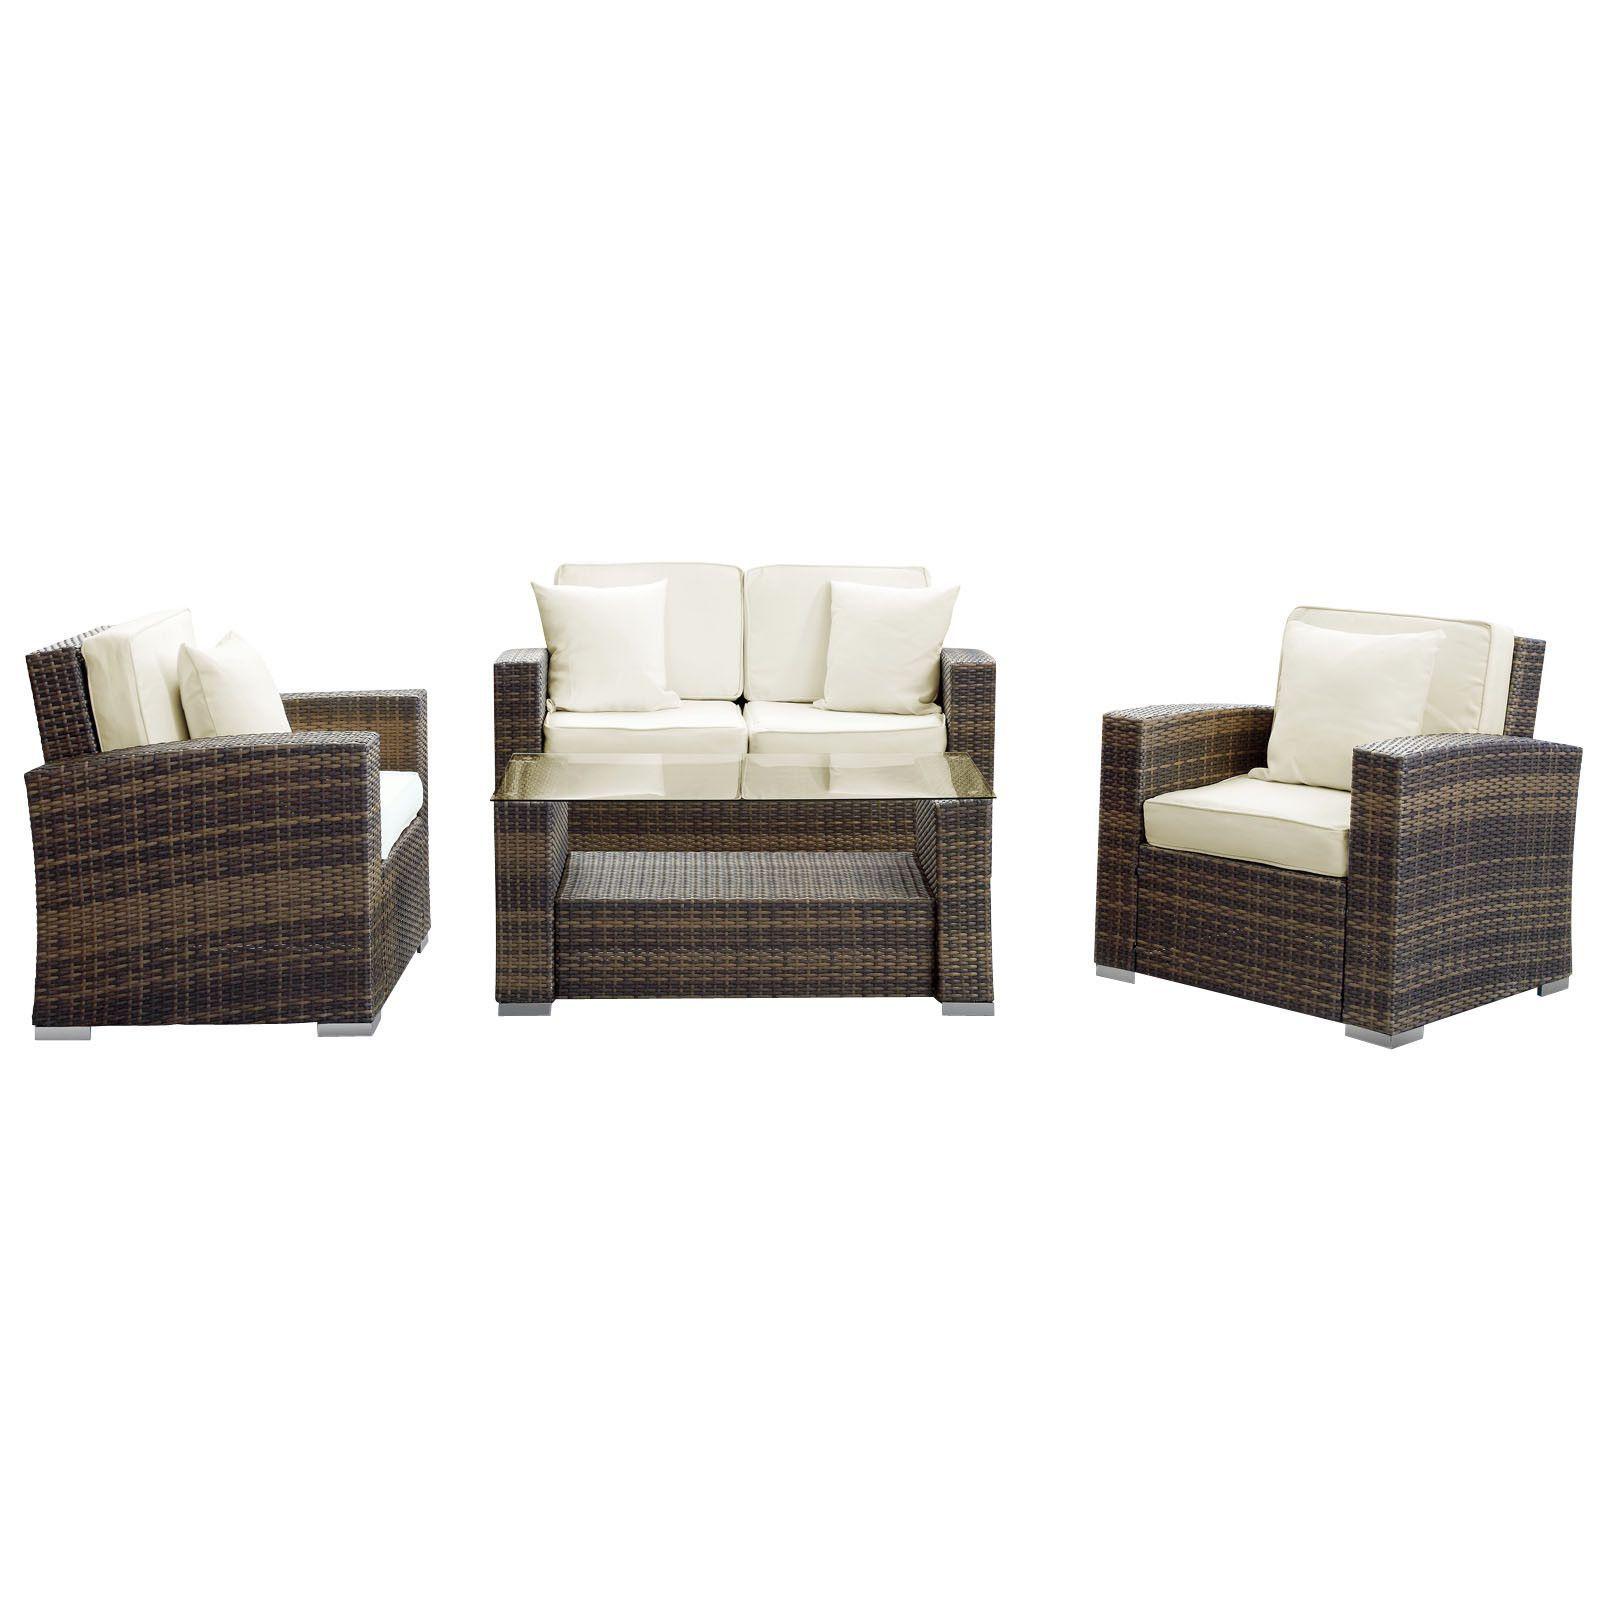 Modway Furniture Carmel 4 Piece Outdoor Patio Sofa Set